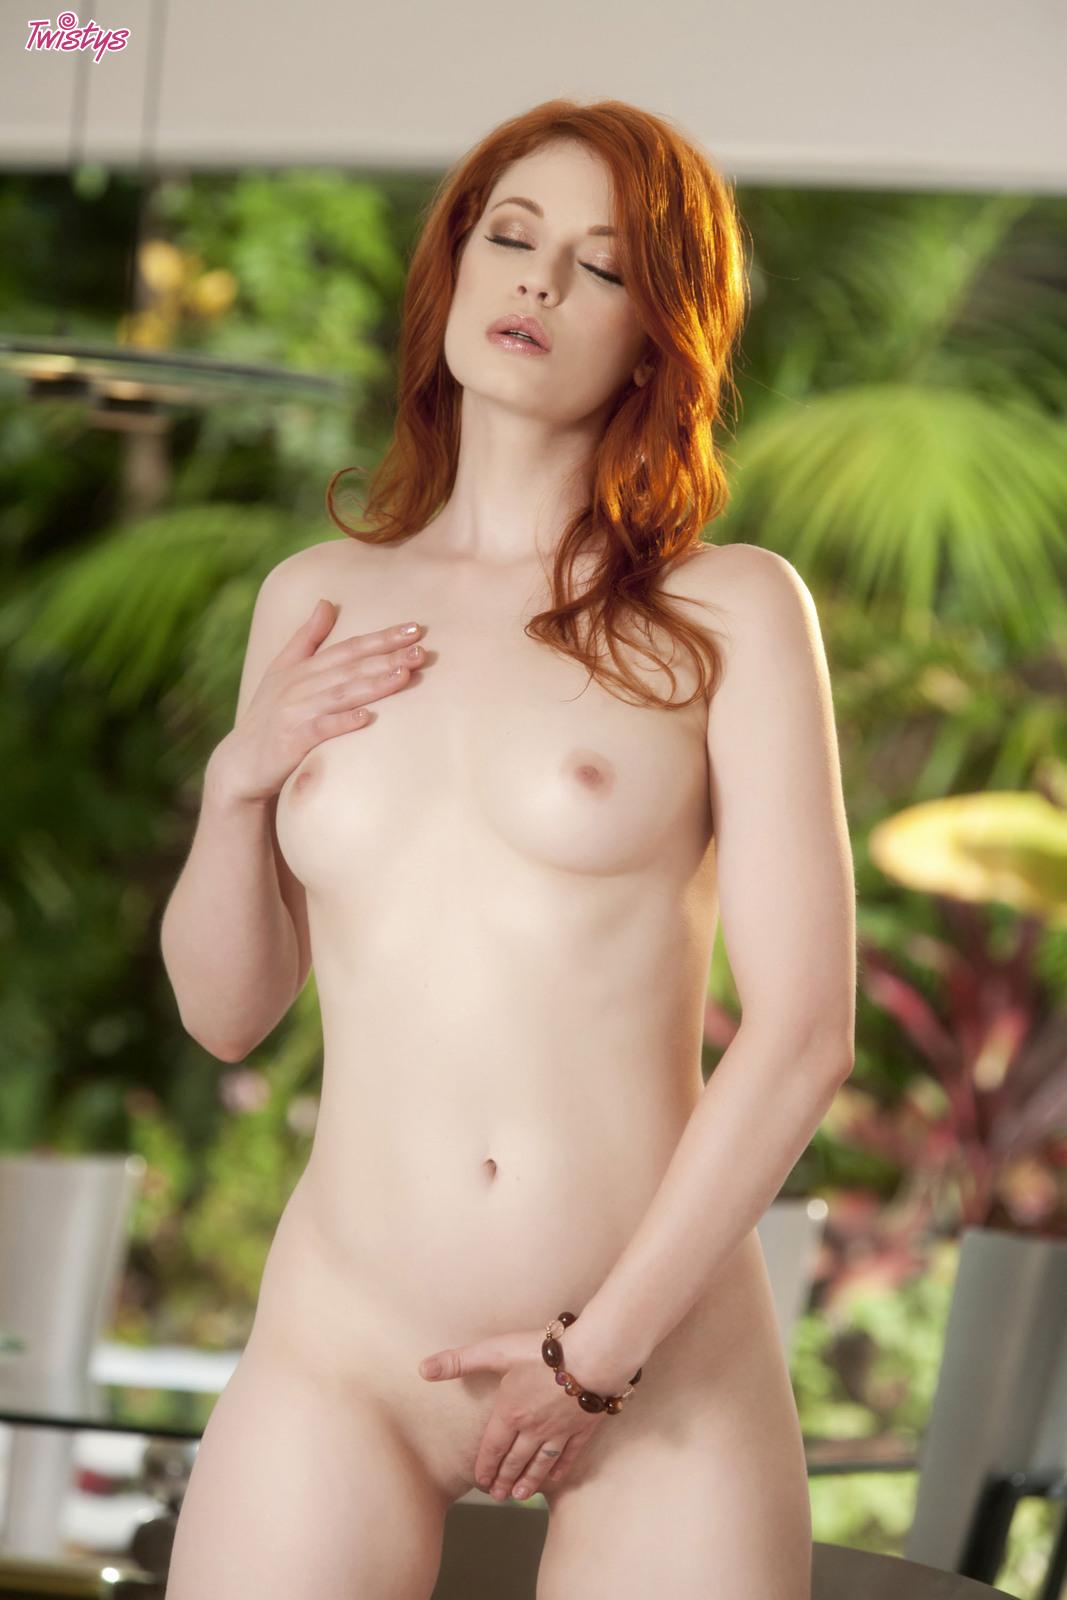 justine-joli-naughty-redhead-naked-twistys-12